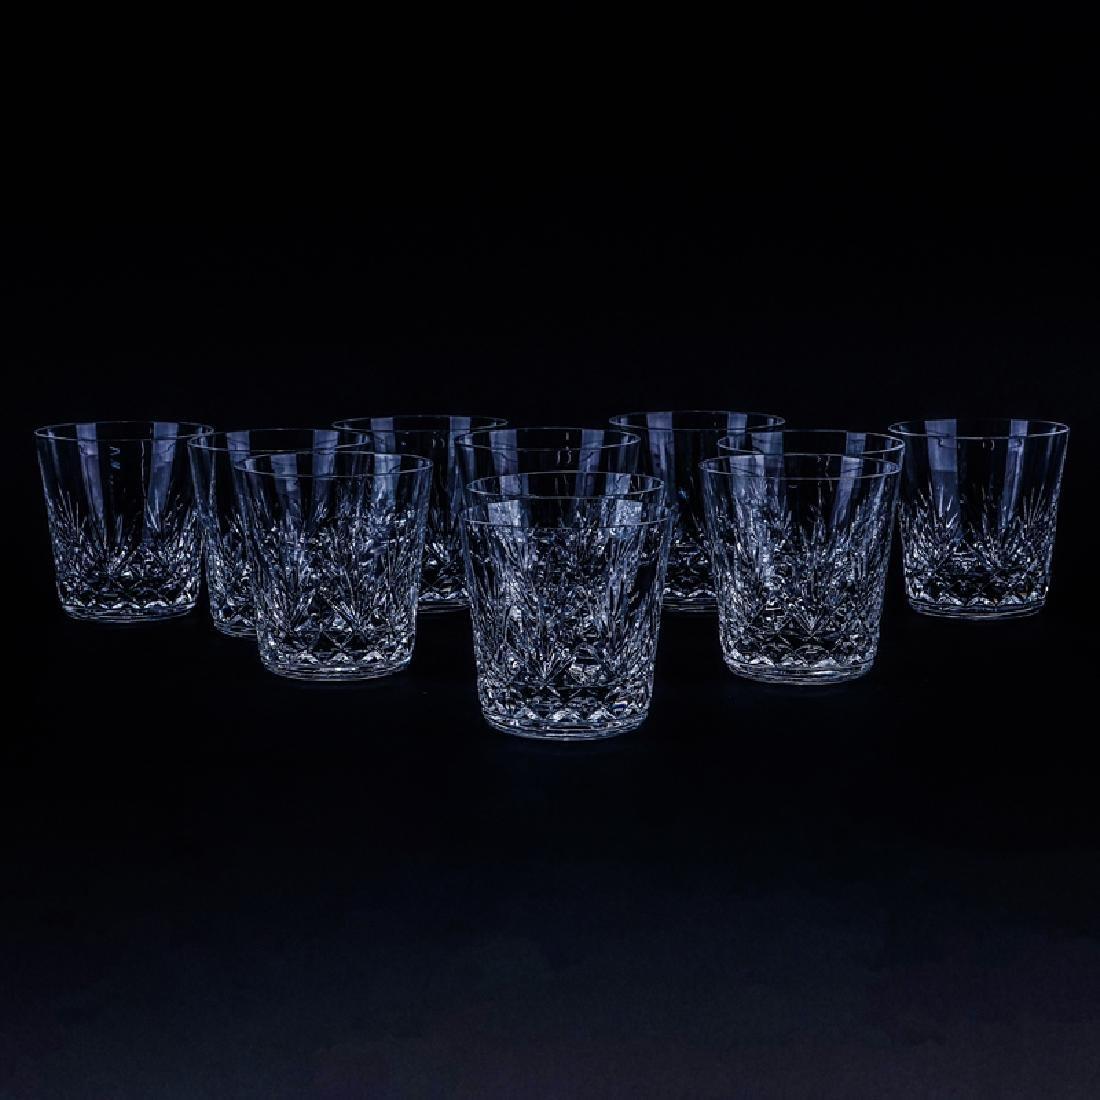 Eleven (11) Saint Louis Cristal Massenet Whiskey